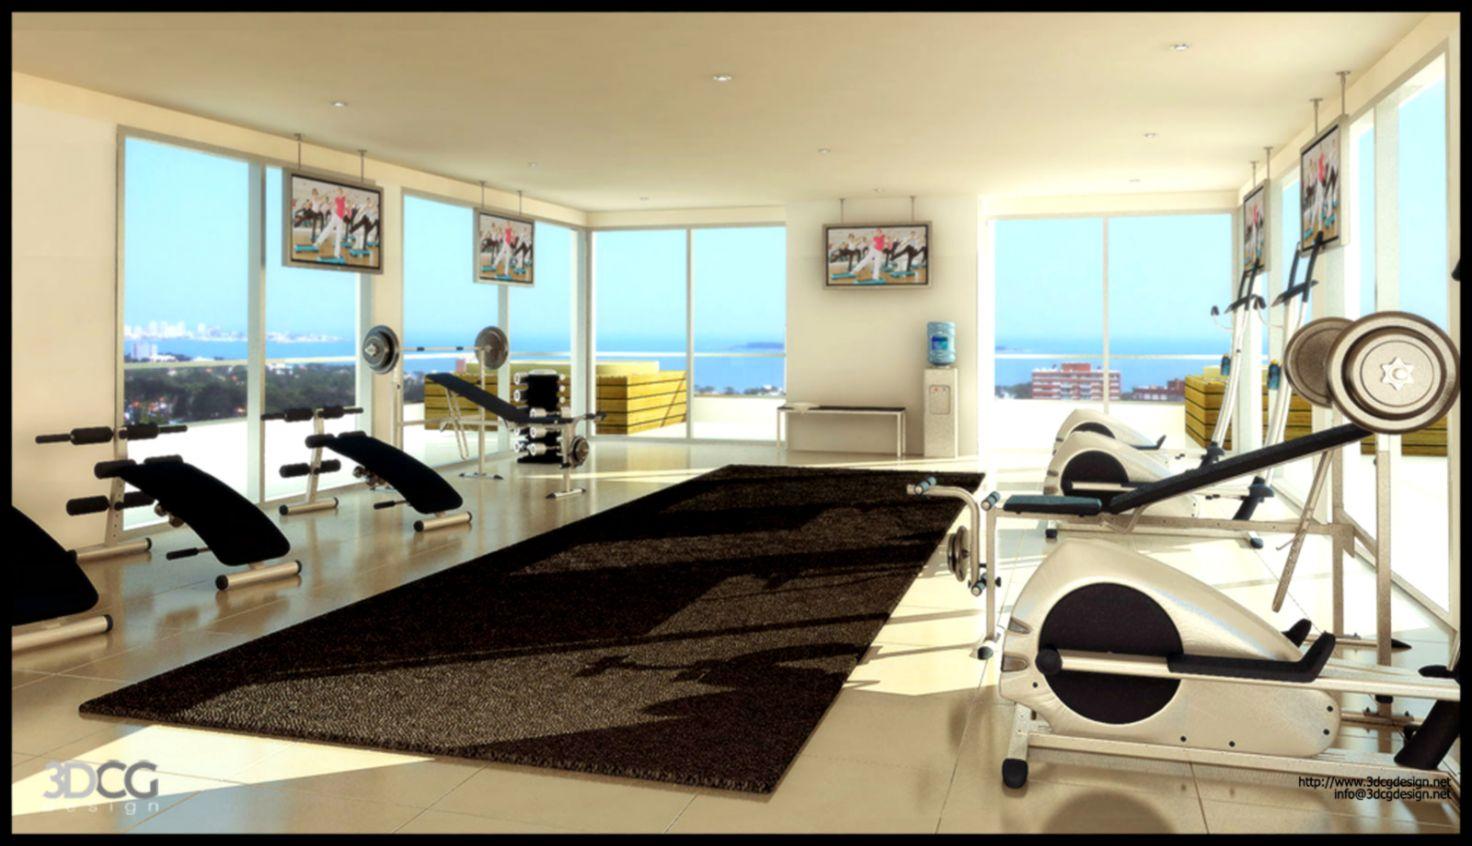 Home gym interior design viva wallpapers